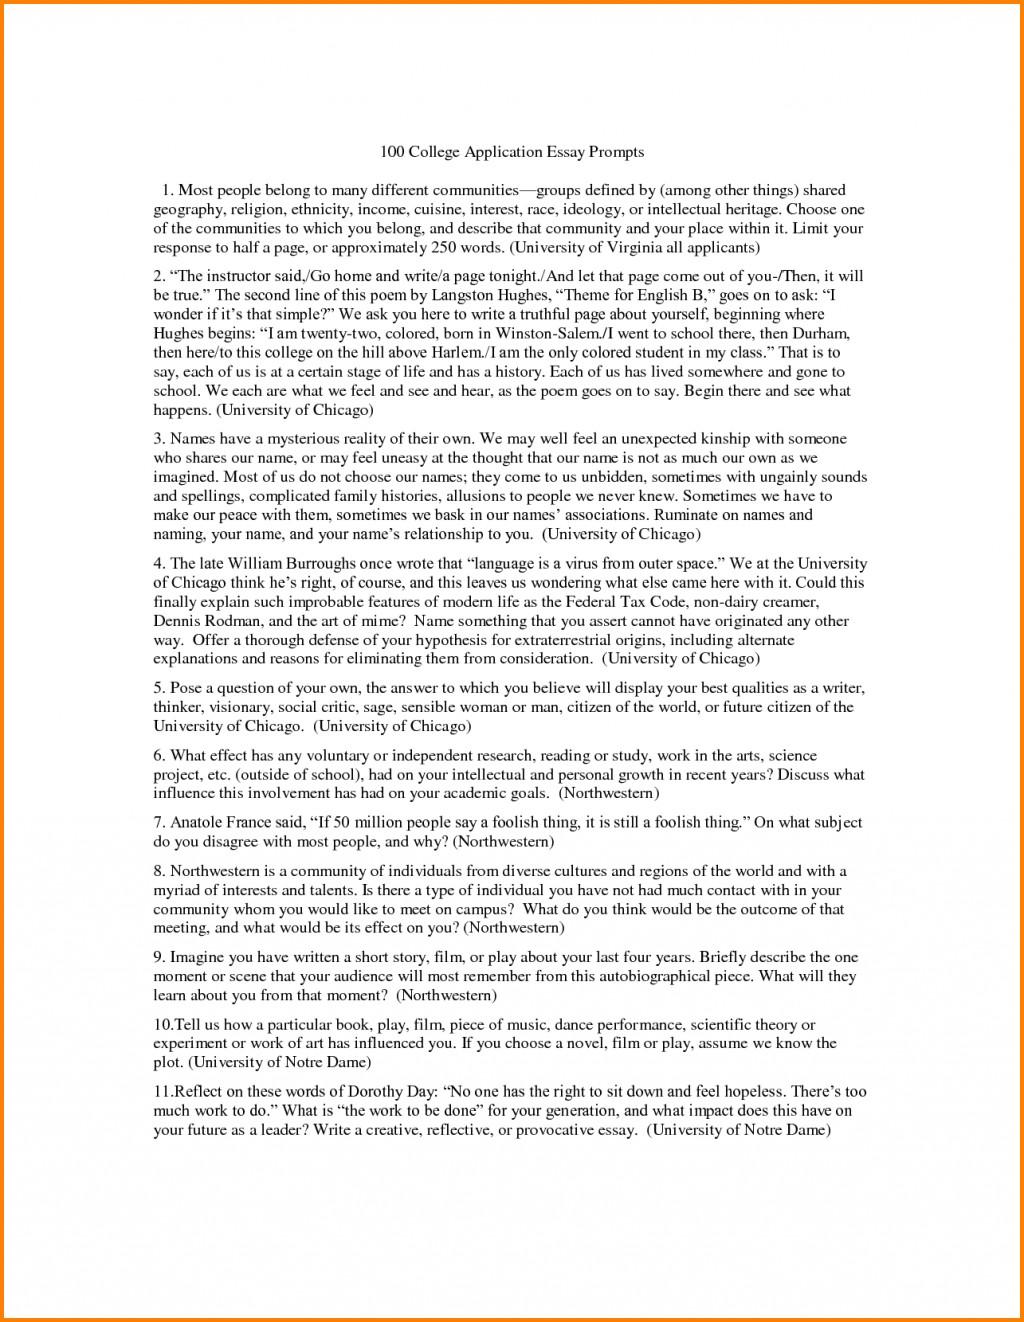 007 Essay Example Scholarship Essays On Future Goals College Prompts L Magnificent Robertson 2018-19 Vanderbilt Washington And Lee Johnson Large